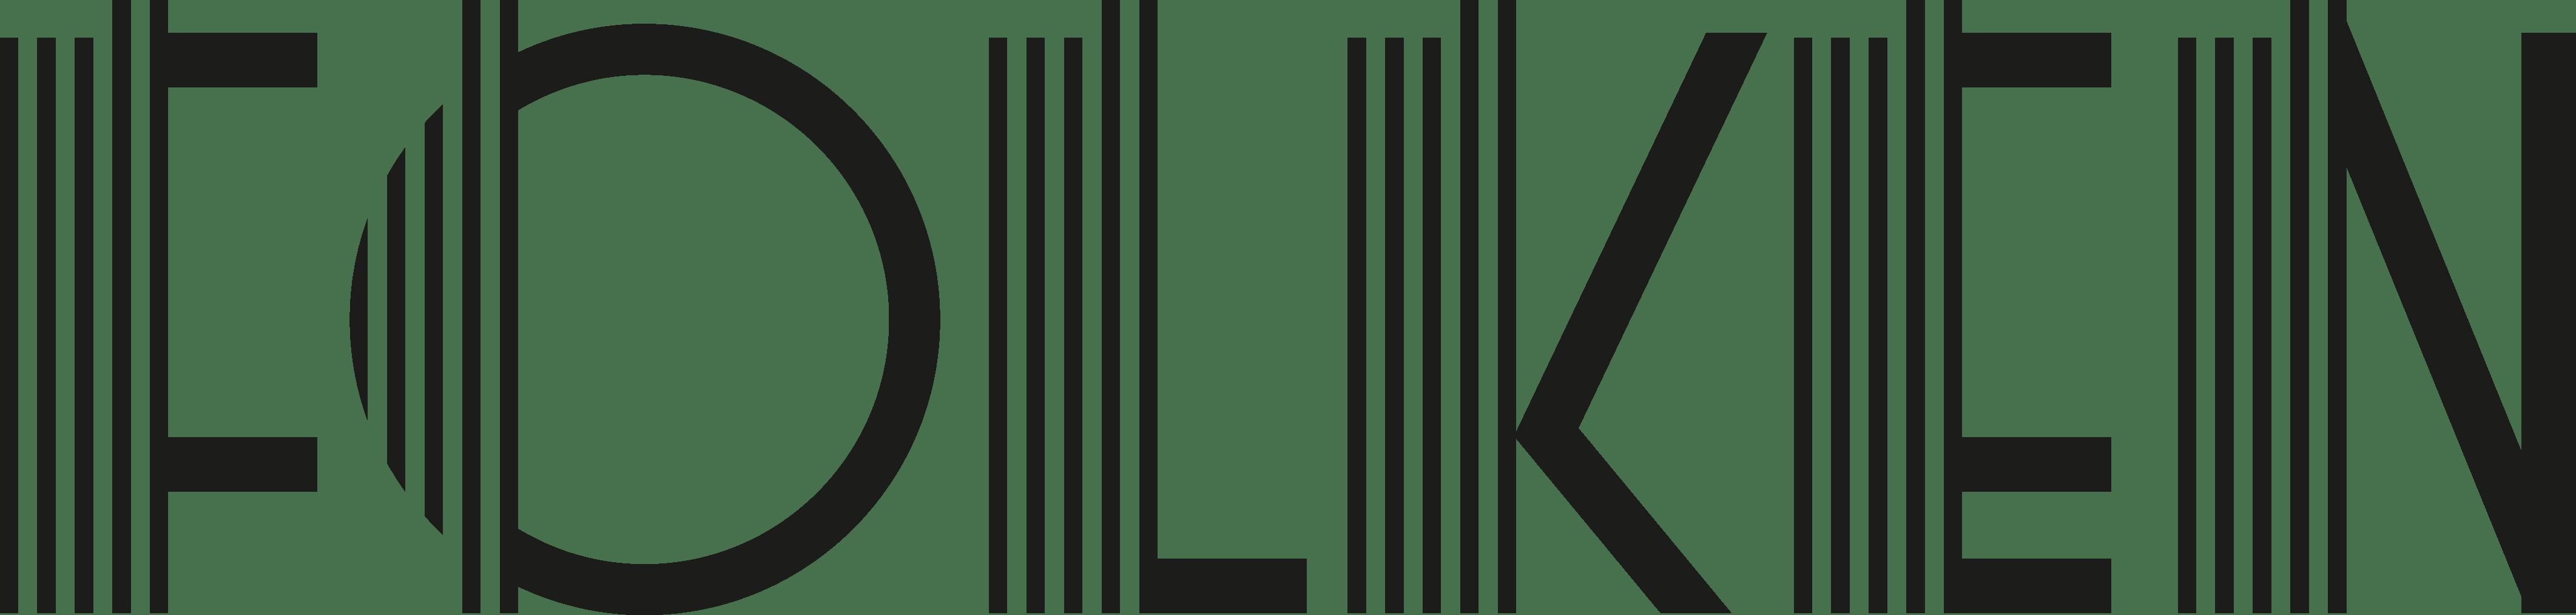 folken logo